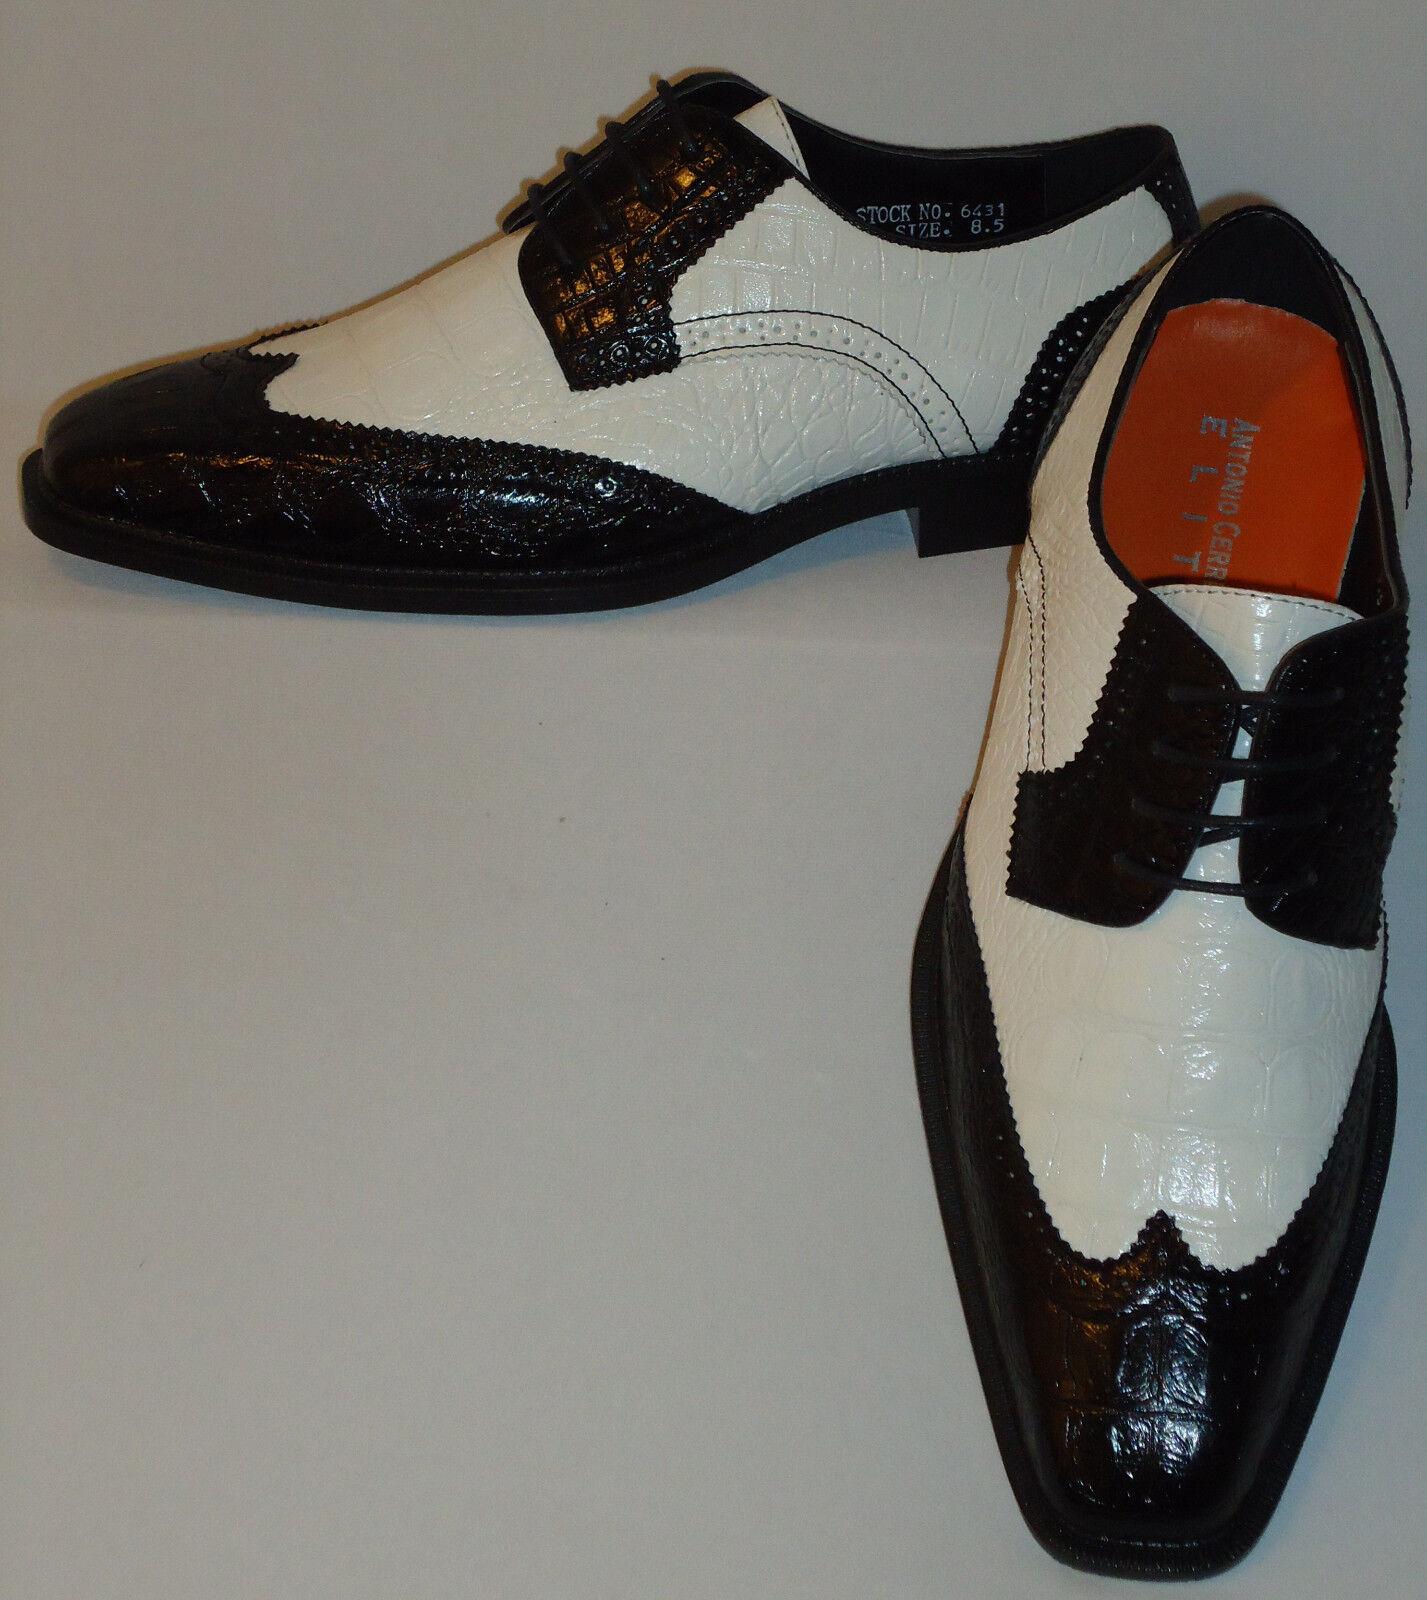 Mens Black + White Classy Old School Wingtip Dress shoes Antonio Cerrelli 6431